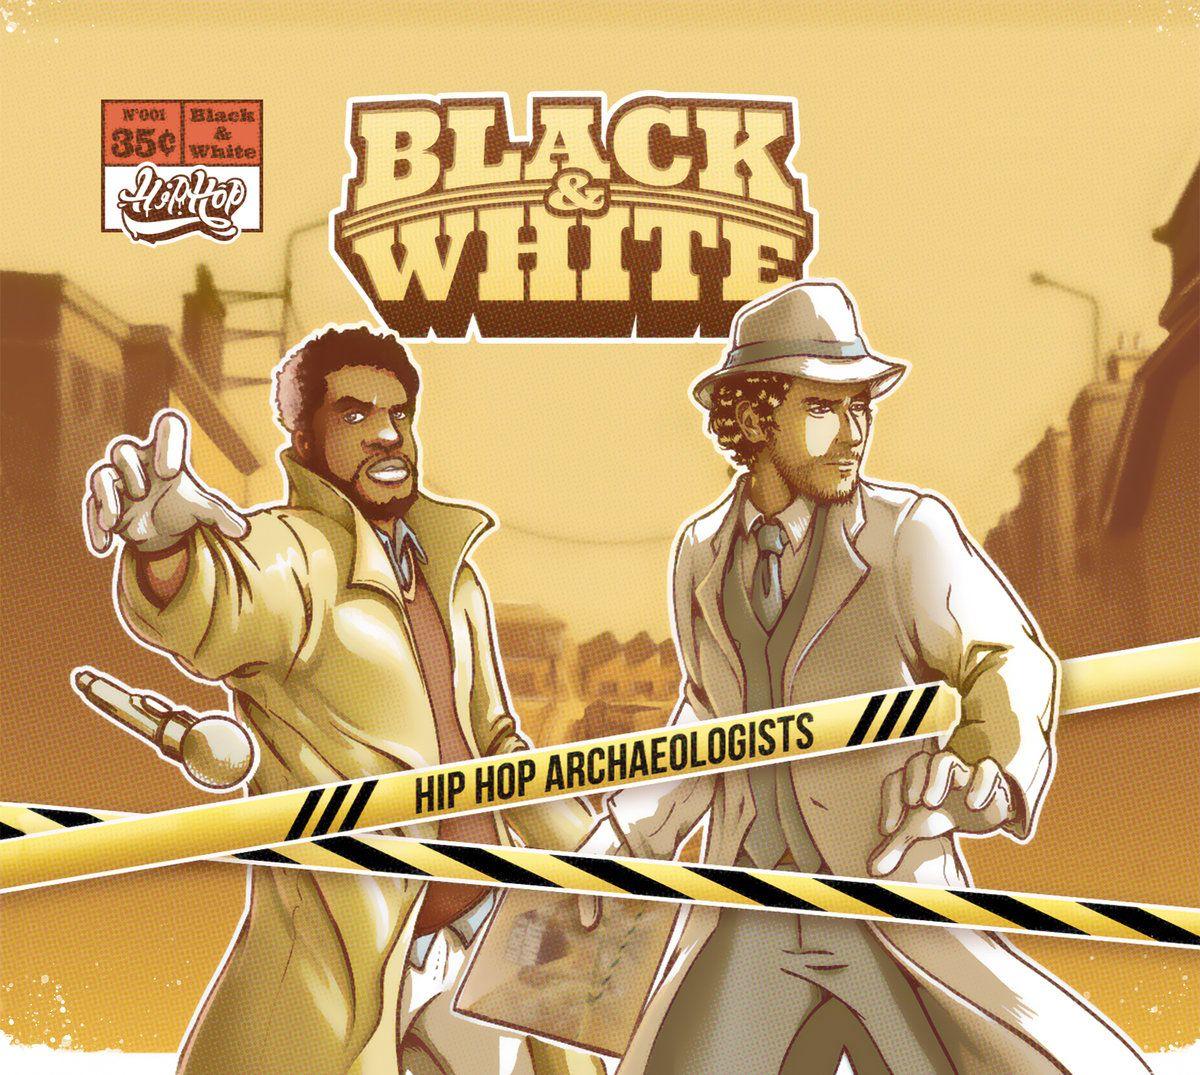 Black white hip hop archaeologists hip hop